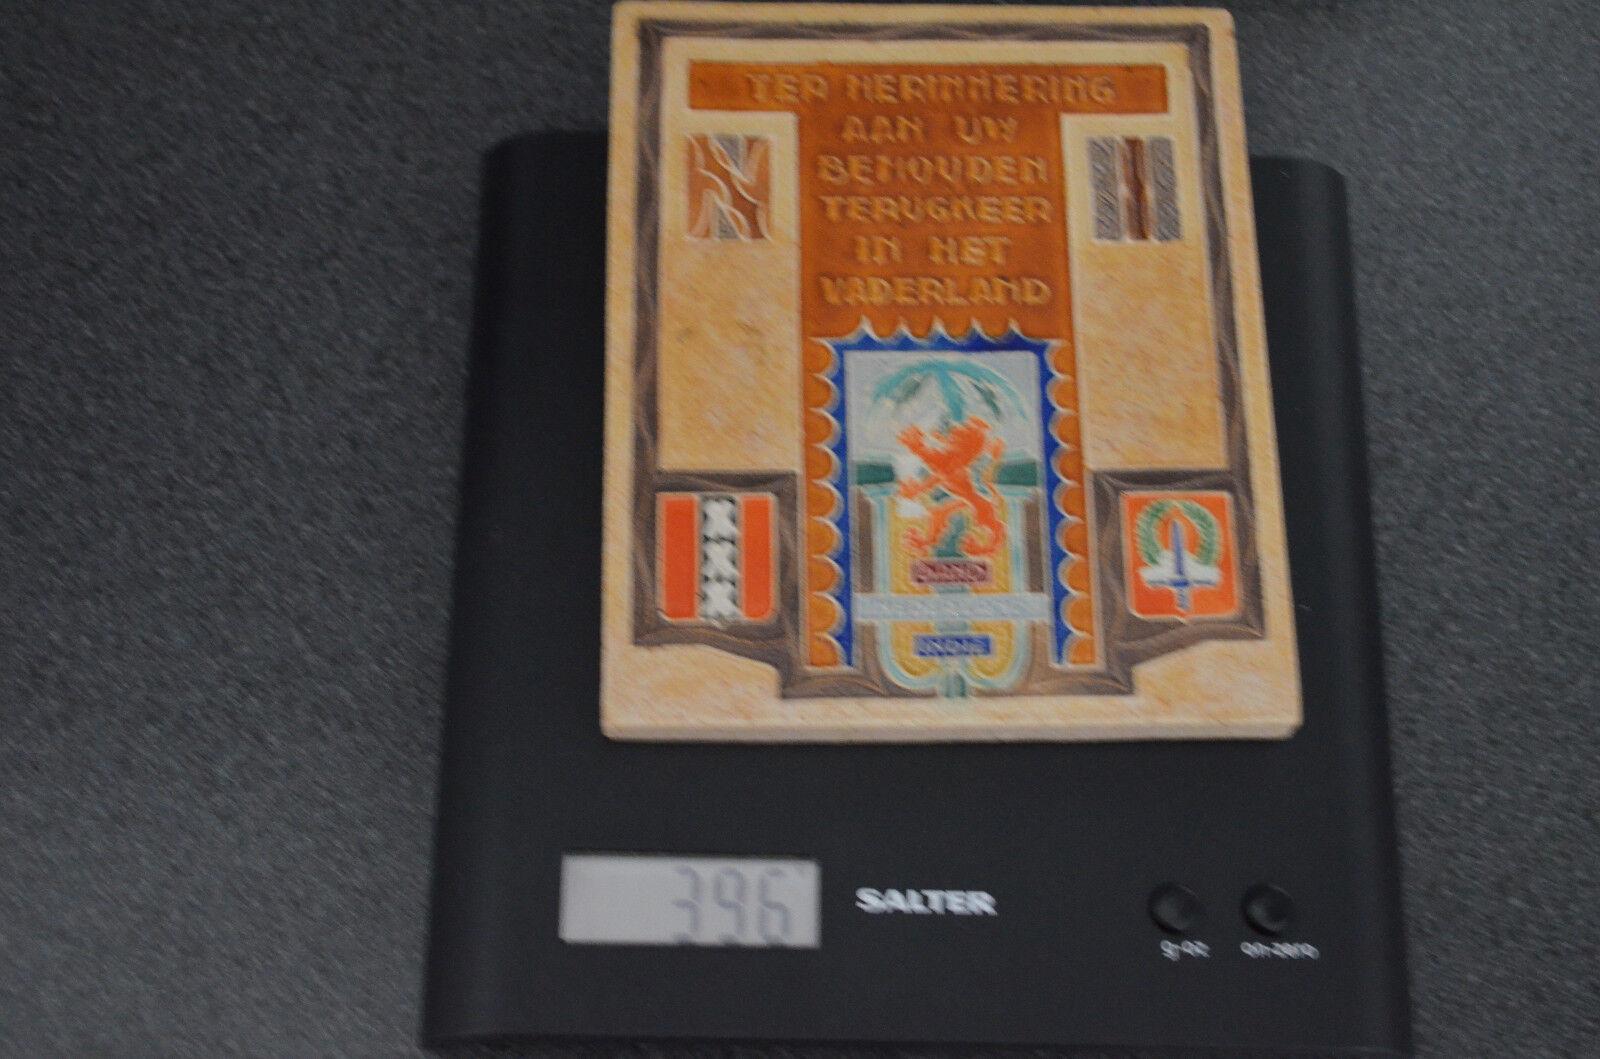 Westraven Cloisonne Azulejo Utrecht Amsterdam Nederlands Indie Indie Nederlands behouden terugkomst 18e776